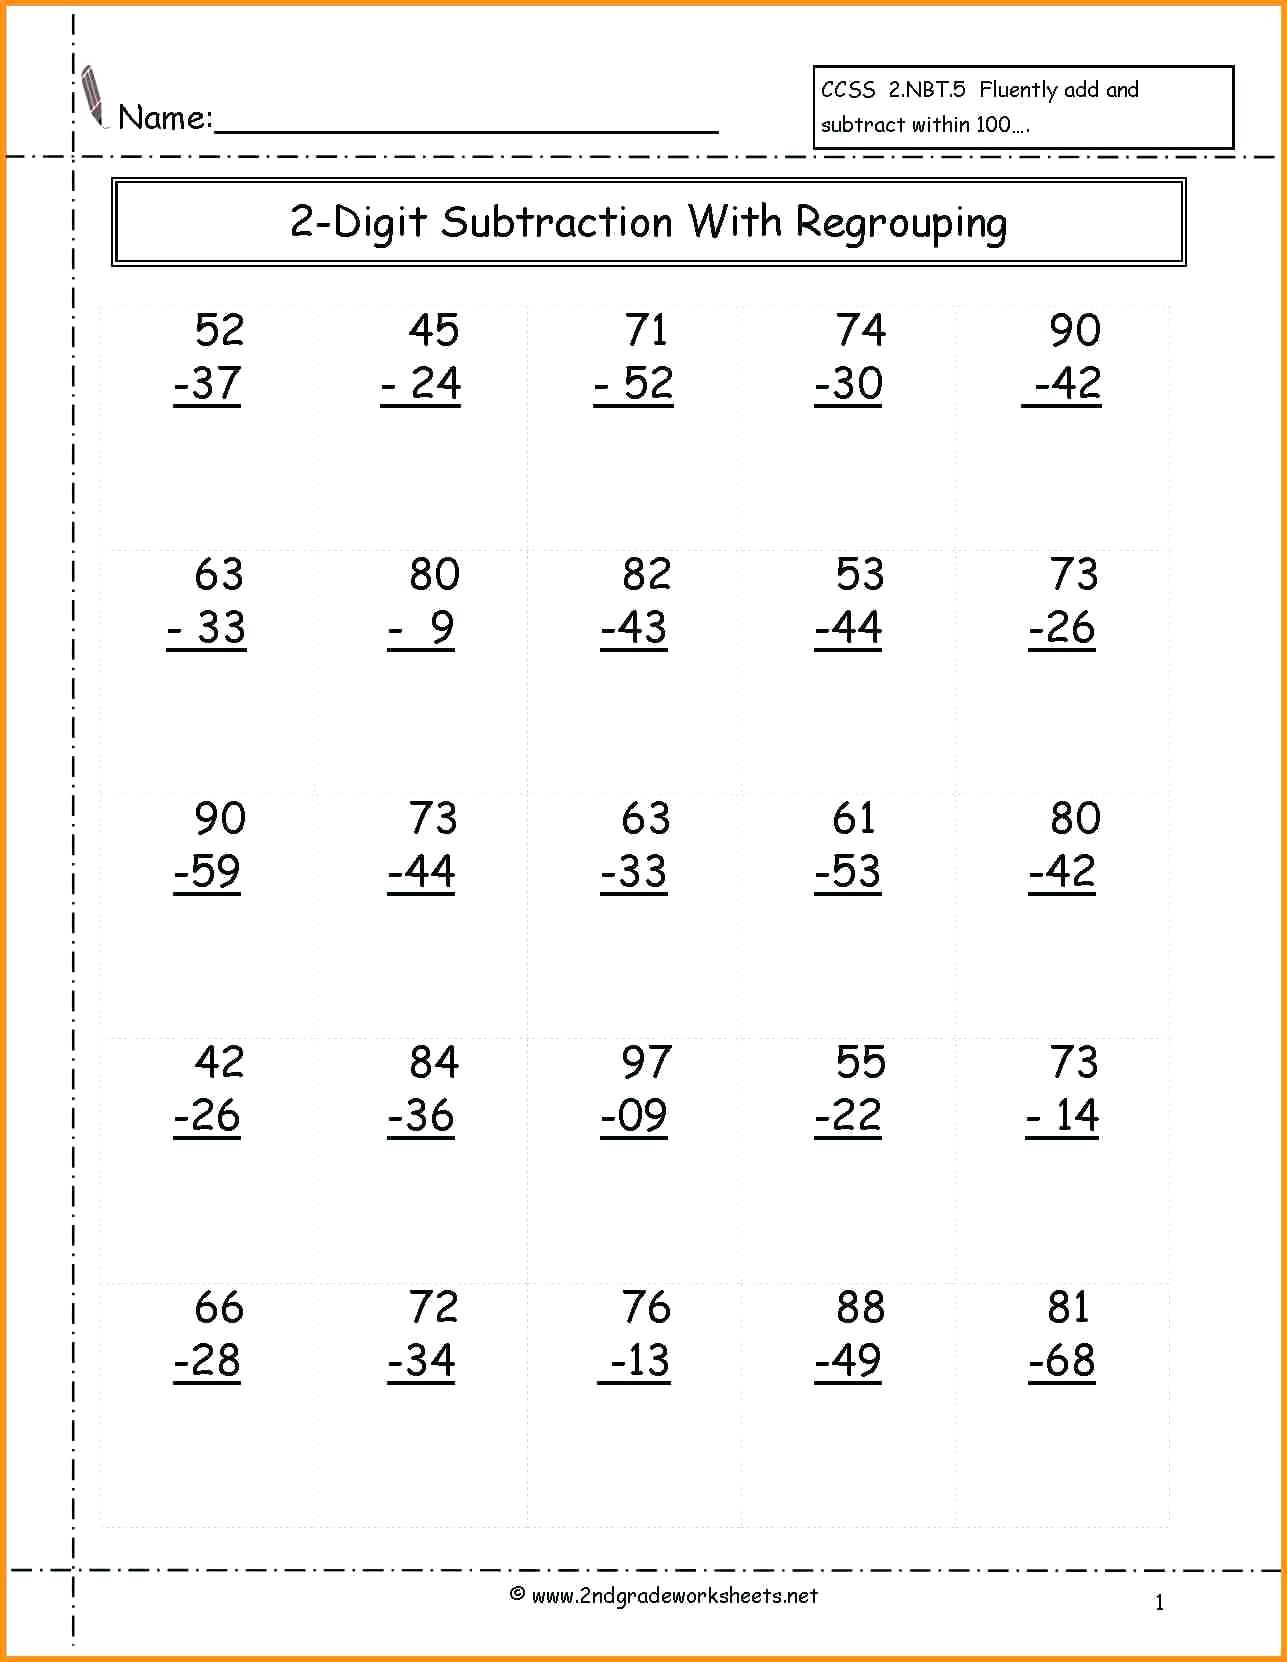 40 Innovative Second Grade Math Worksheets Design Ideas